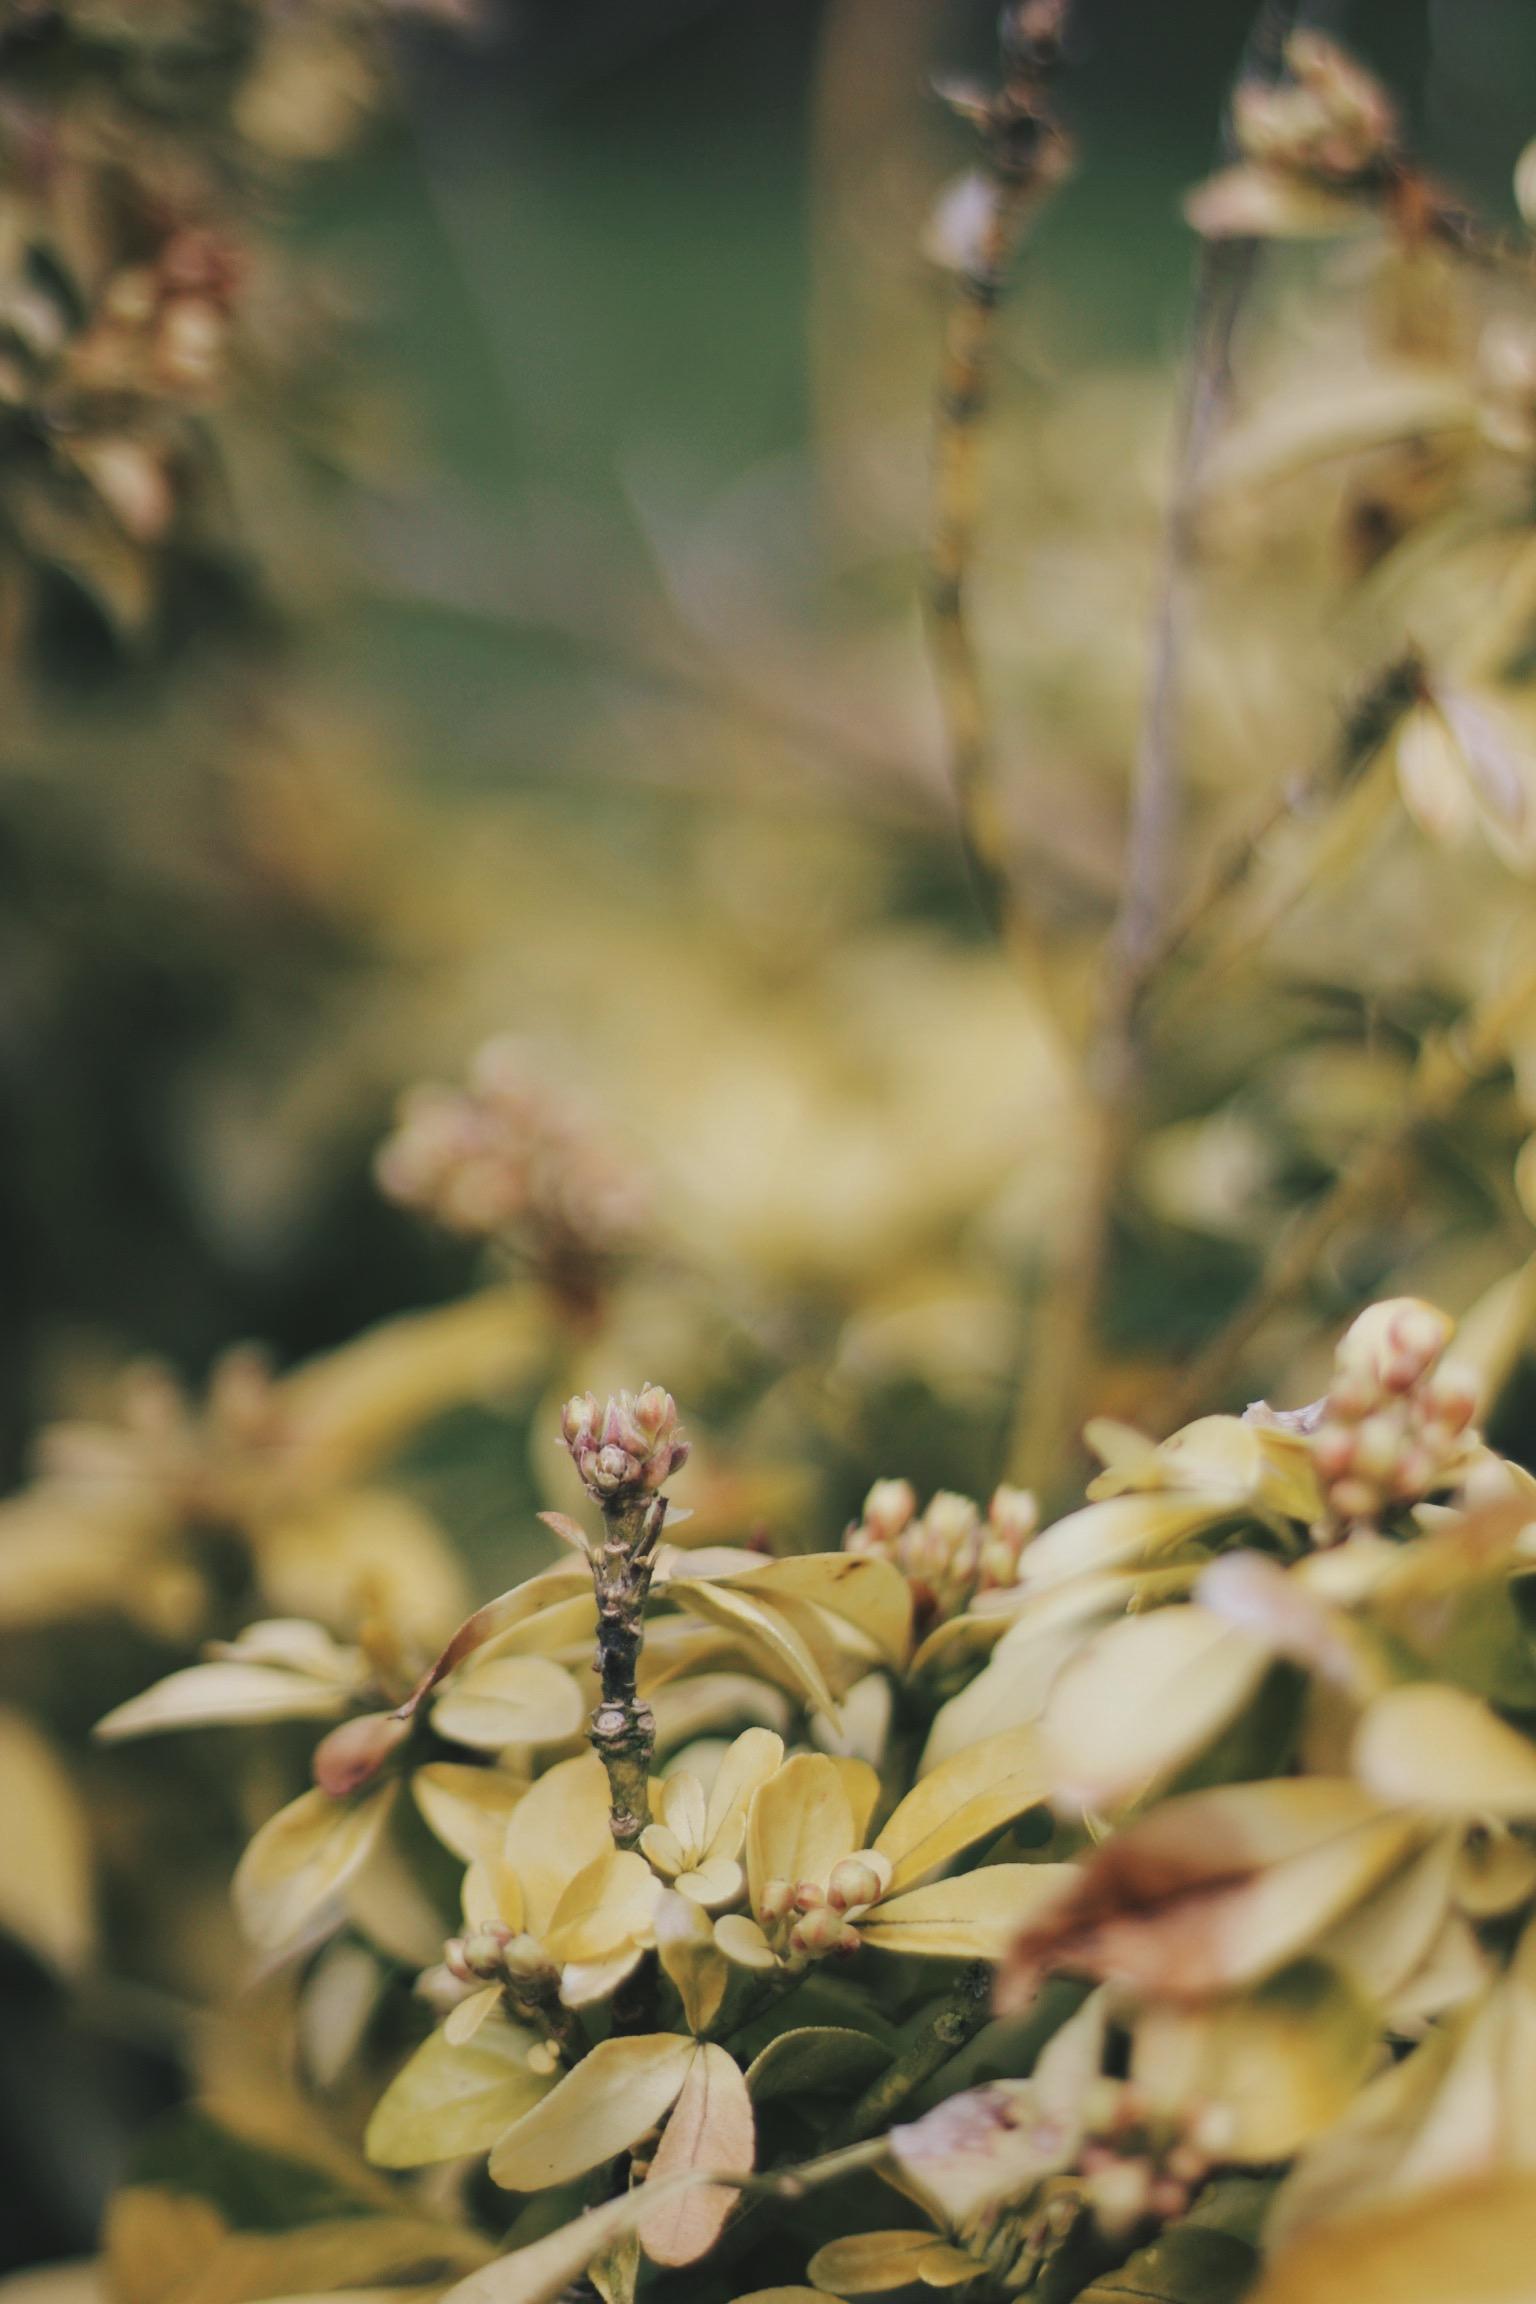 Bokeh with plants